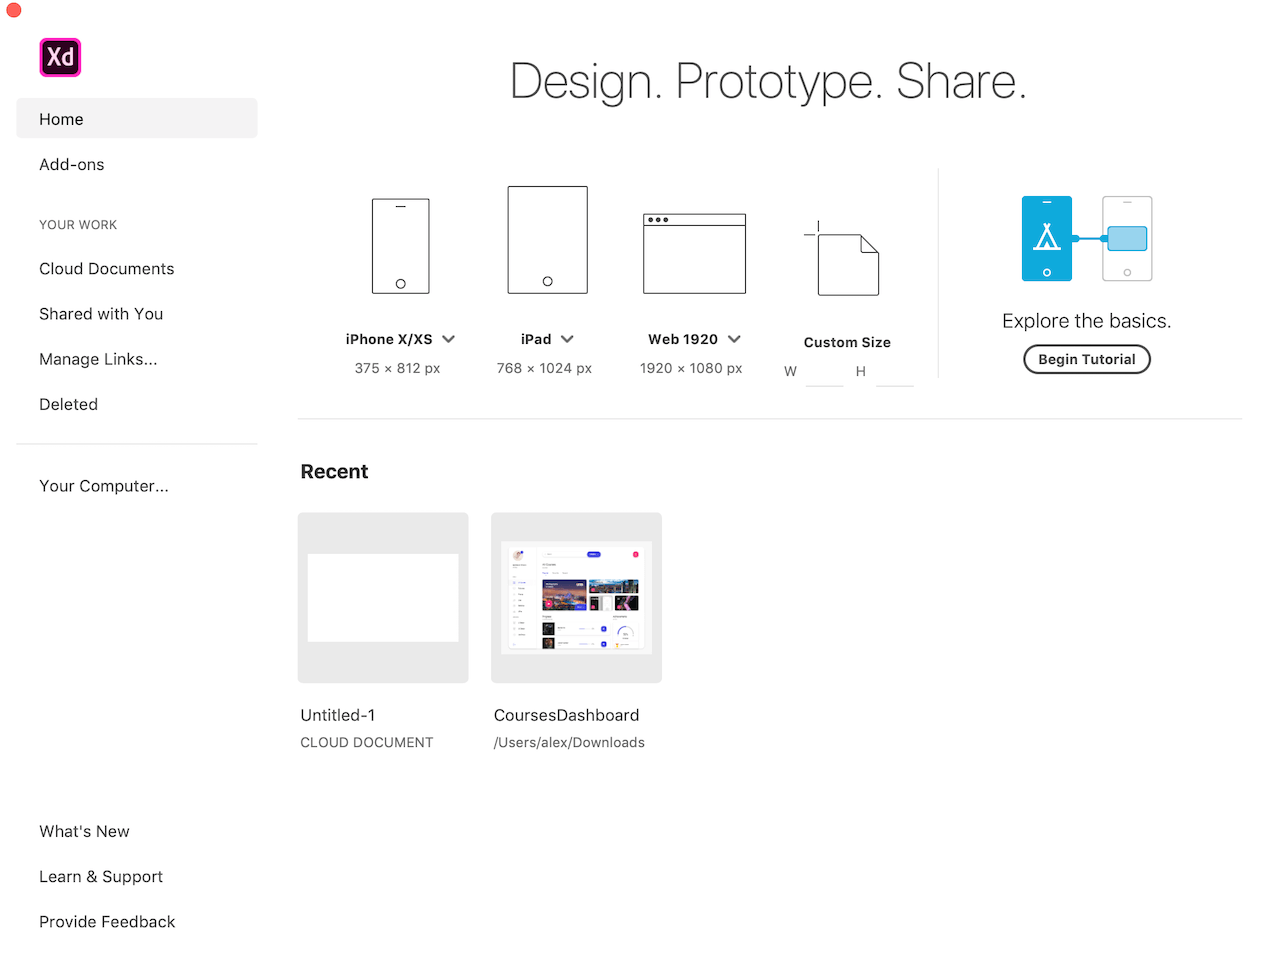 Prototype and Design with Adobe XD